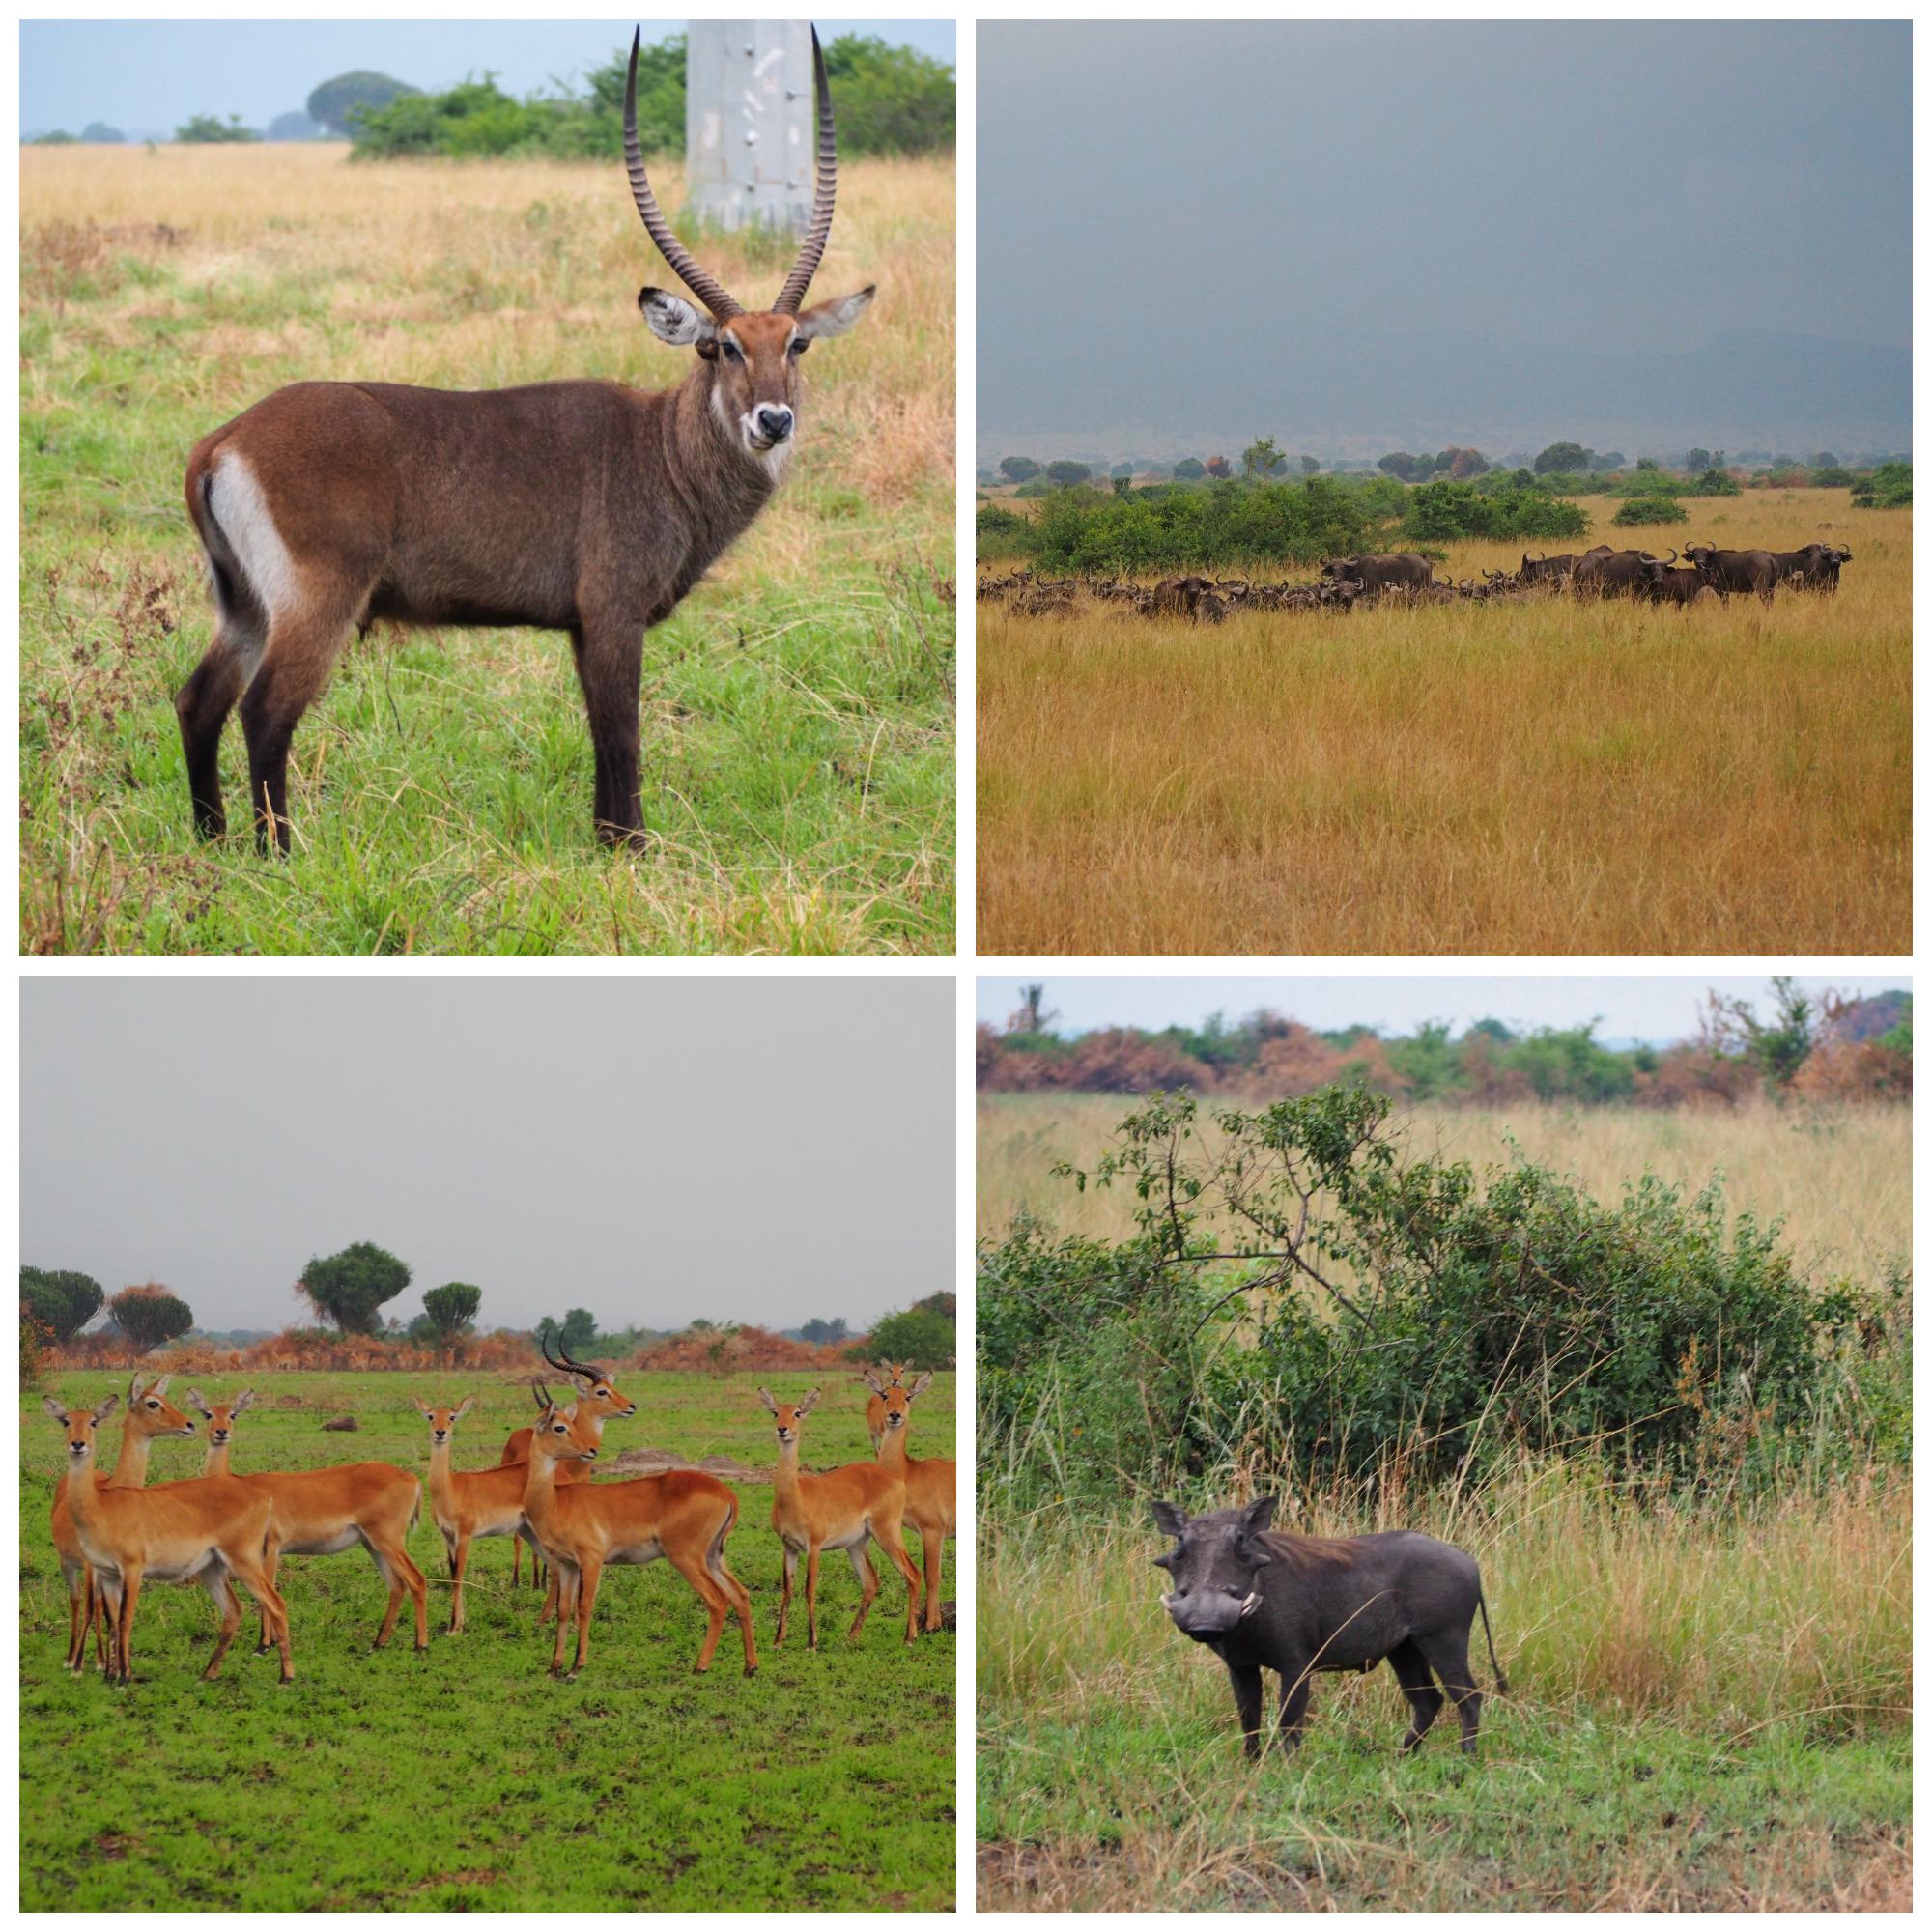 Animal sightings before the rain: waterbuck, cap buffalo, kob, and warthog